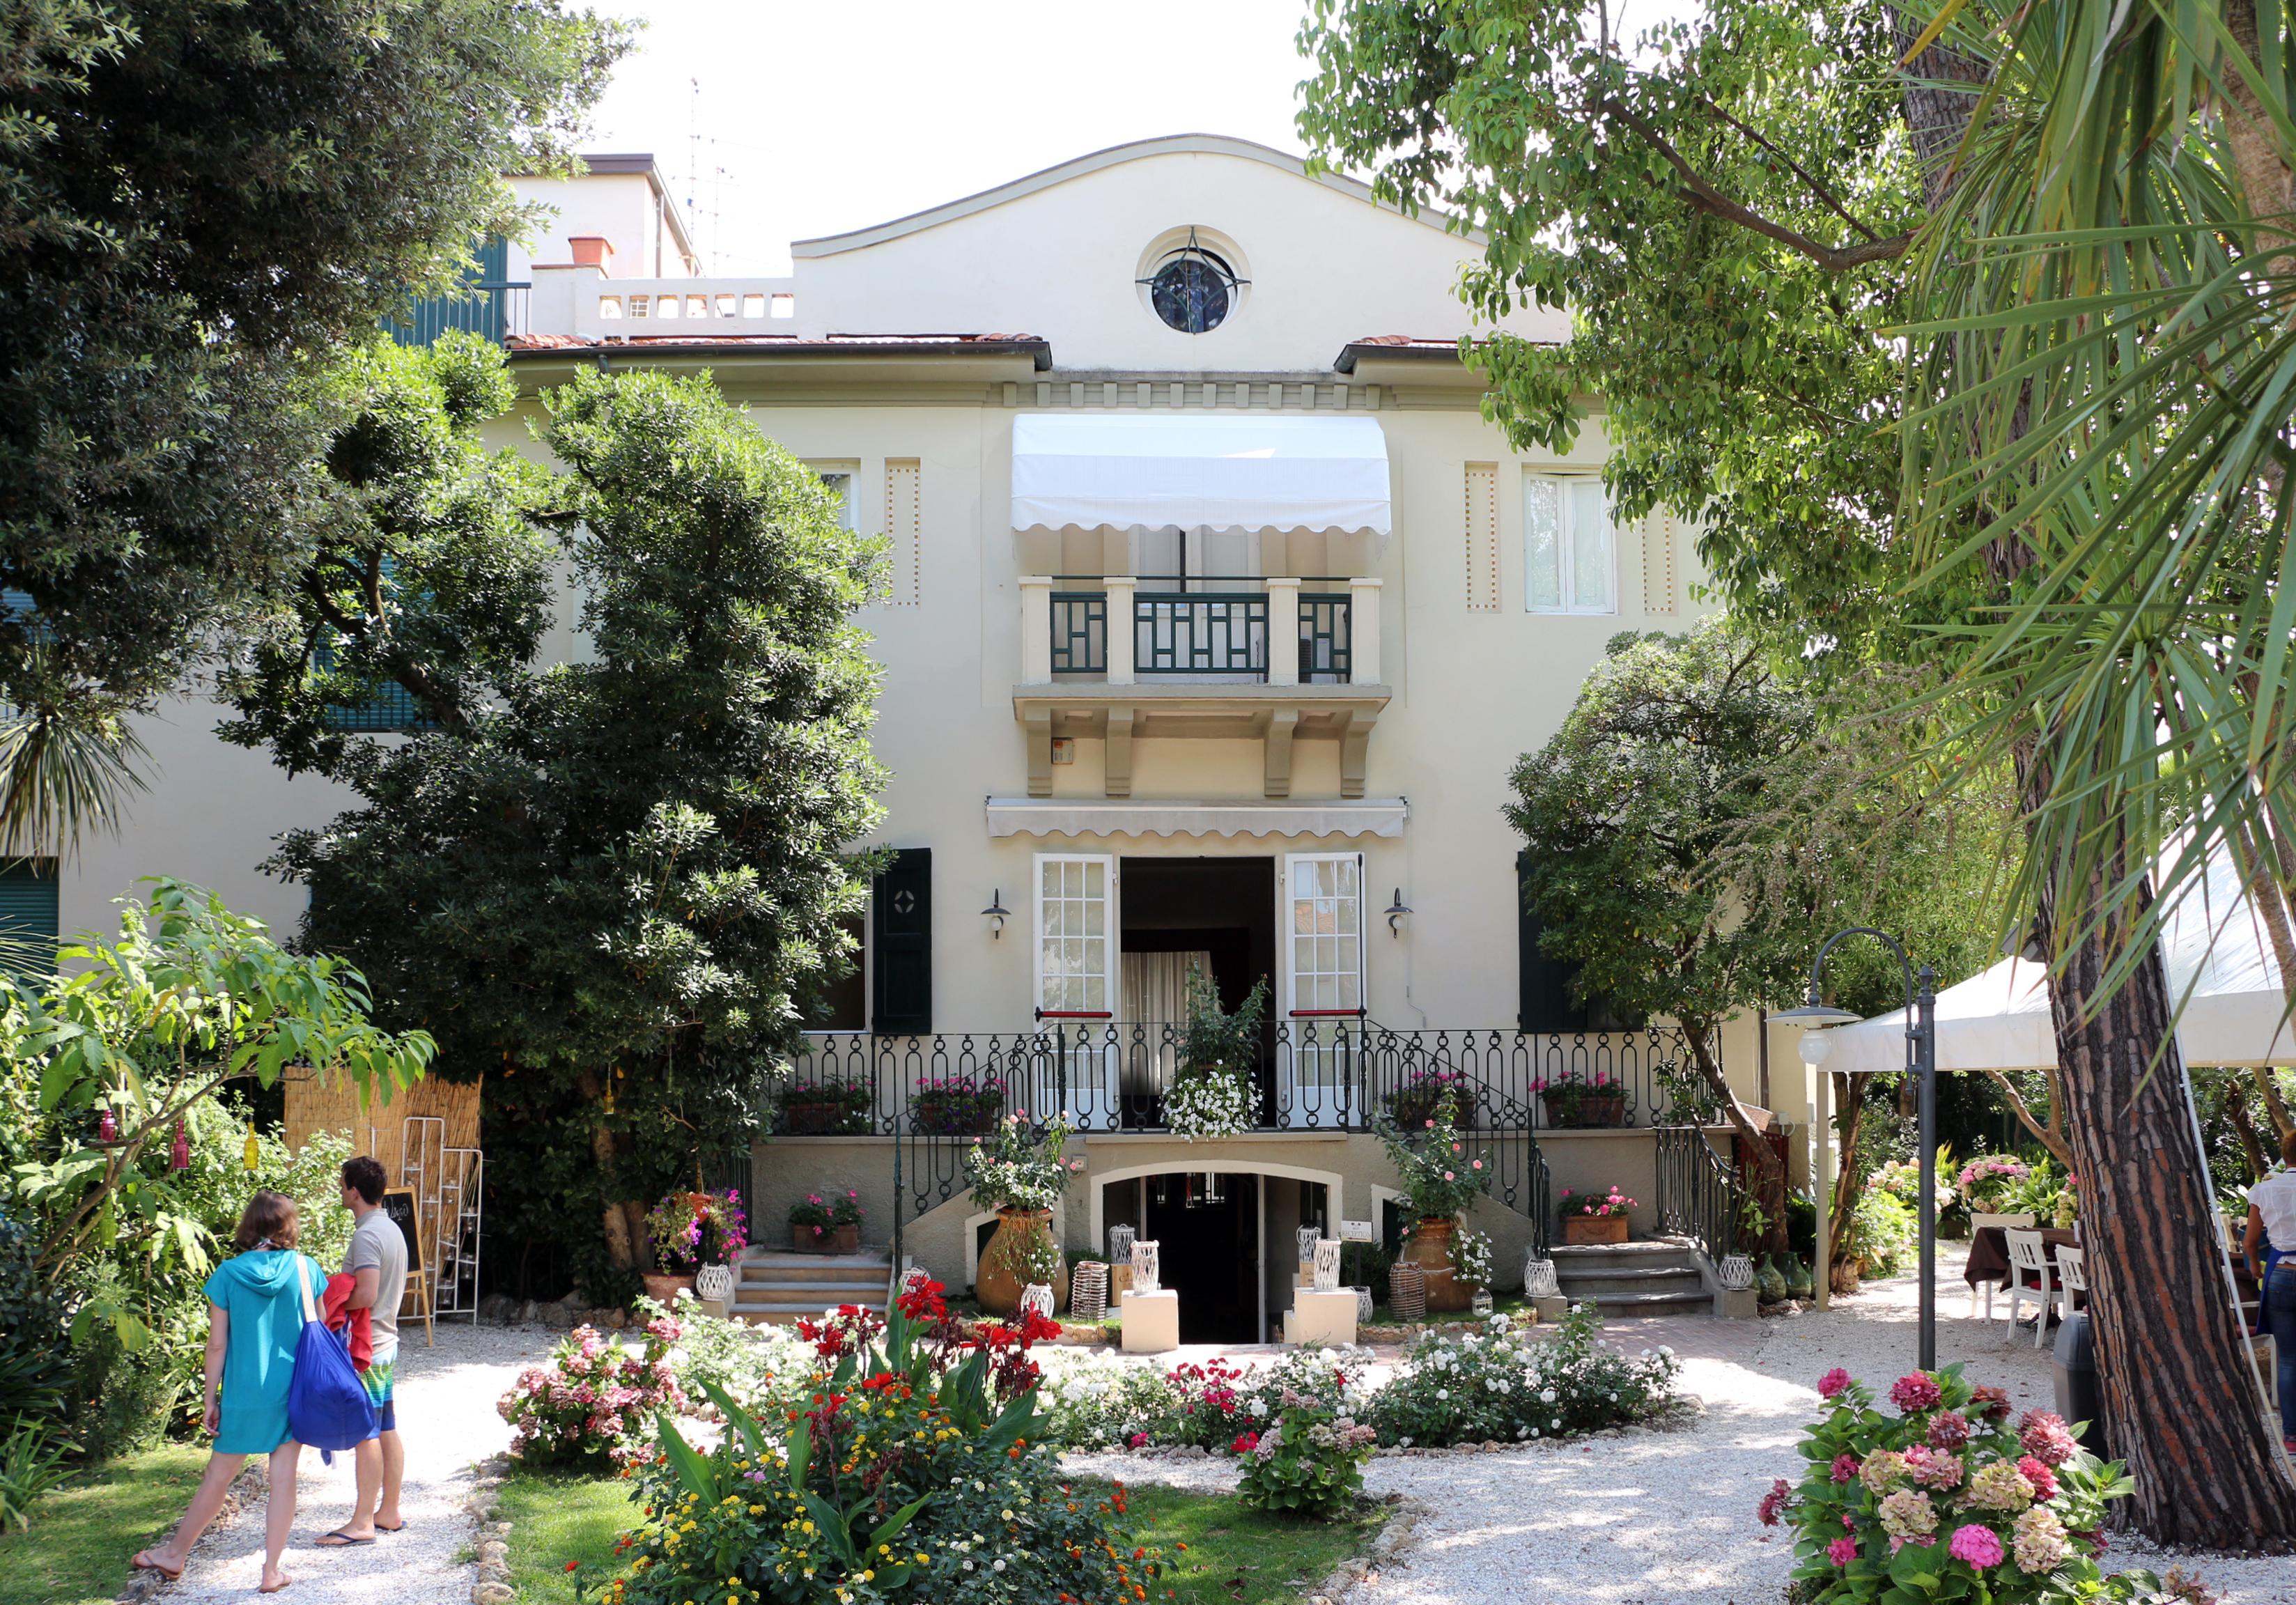 Casa esterno excellent la casa del buono lesterno with casa esterno latest la casa del buono - La casa delle vacanze ...